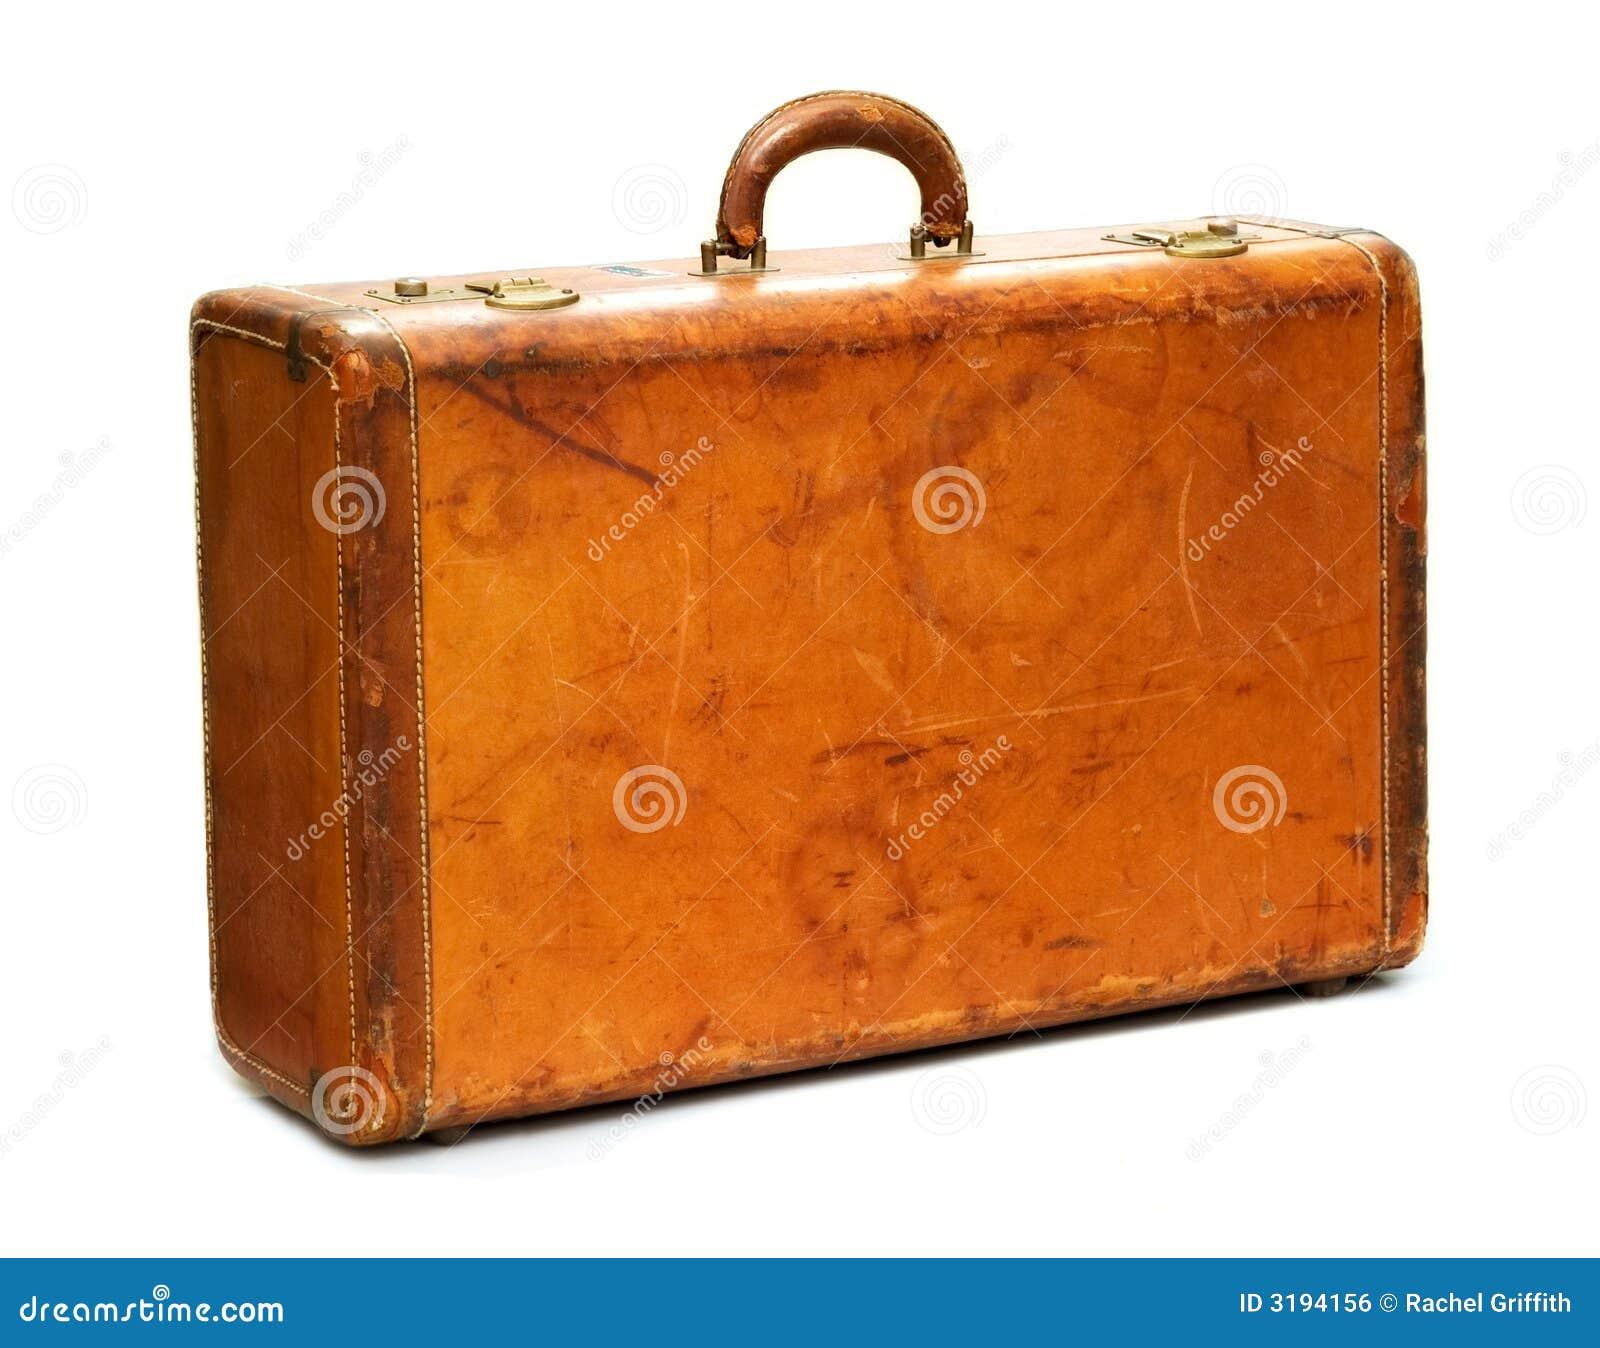 Well-Traveled Vintage Suitcase Royalty Free Stock Image - Image ...